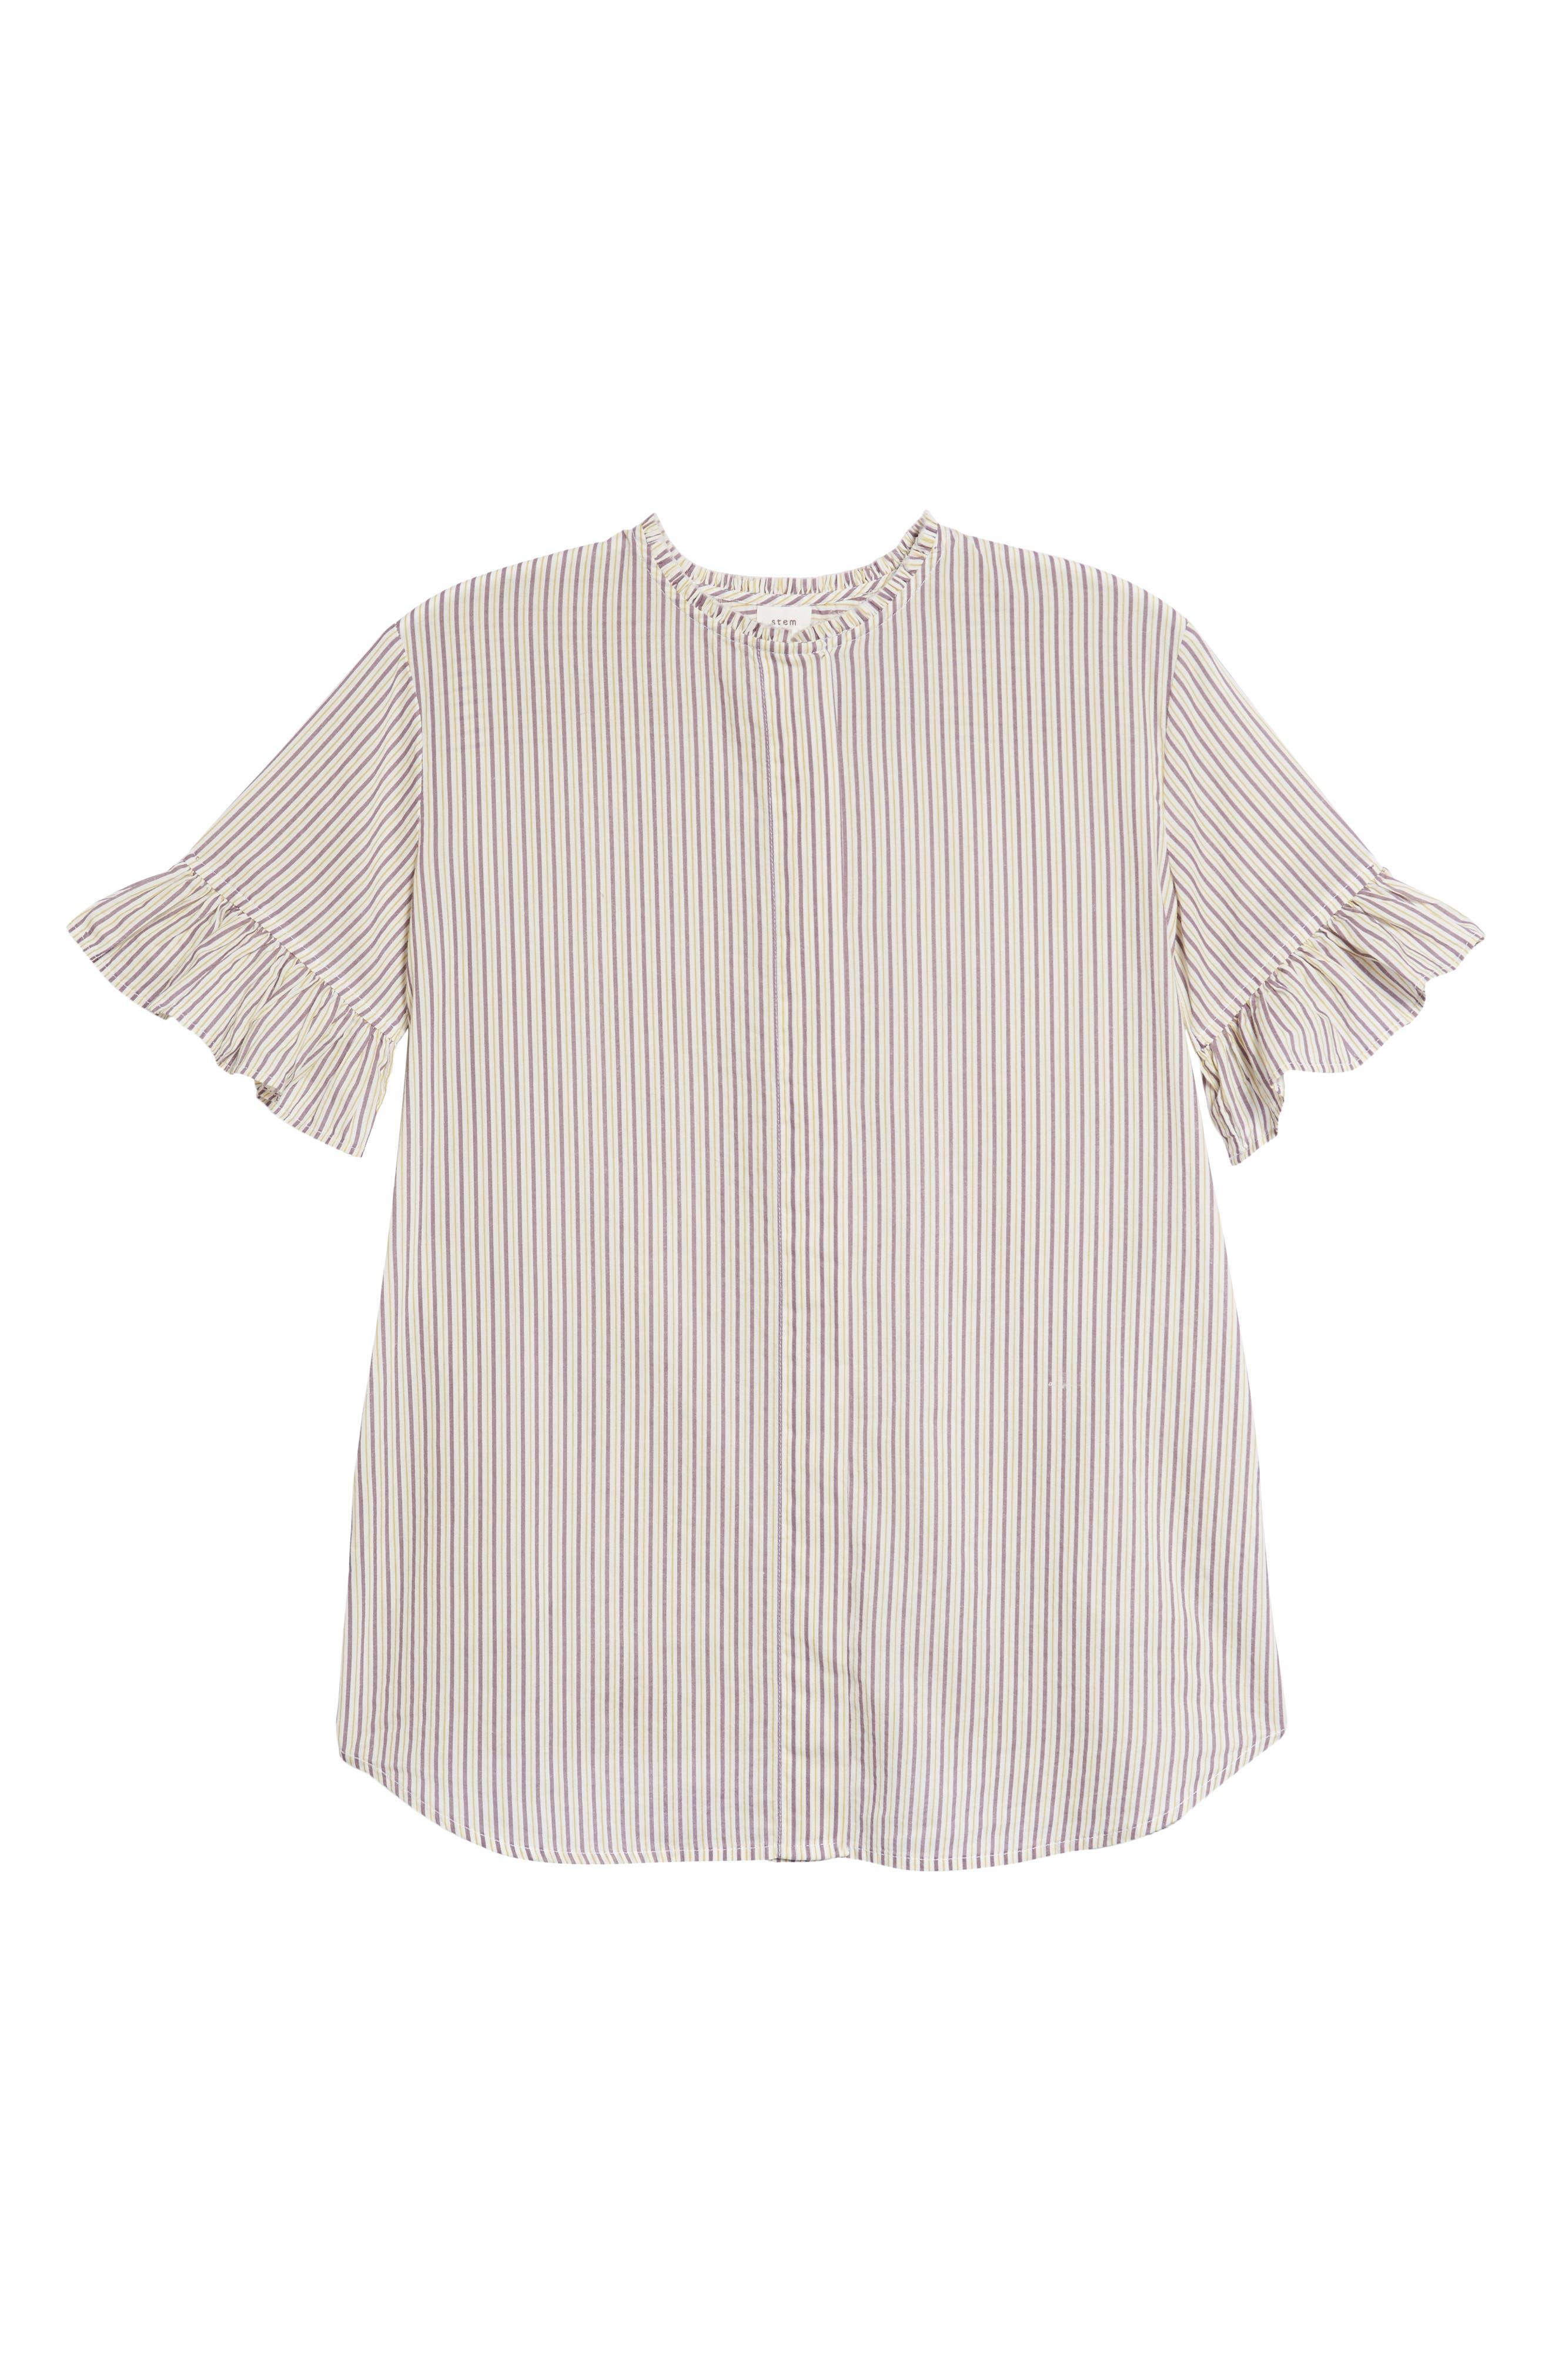 Ruffle Stripe Shirtdress,                             Main thumbnail 1, color,                             White Multi Stripe